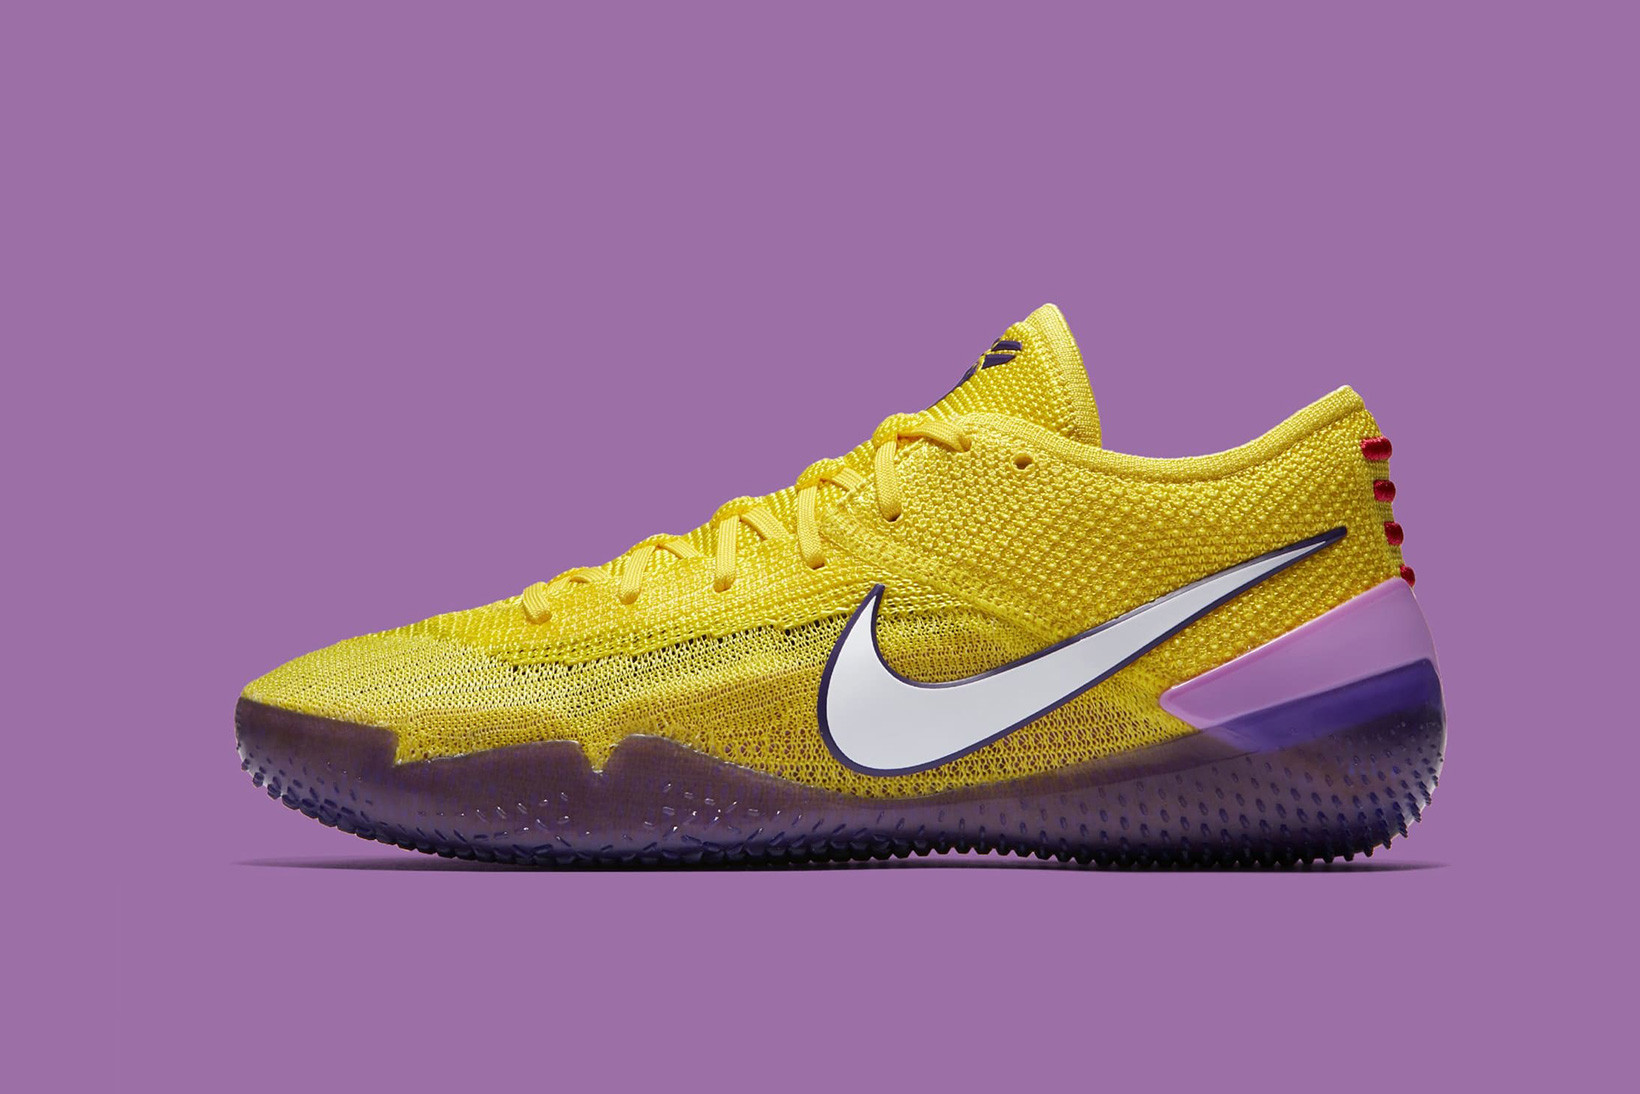 Nike Kobe AD NXT 360 Lakers Release